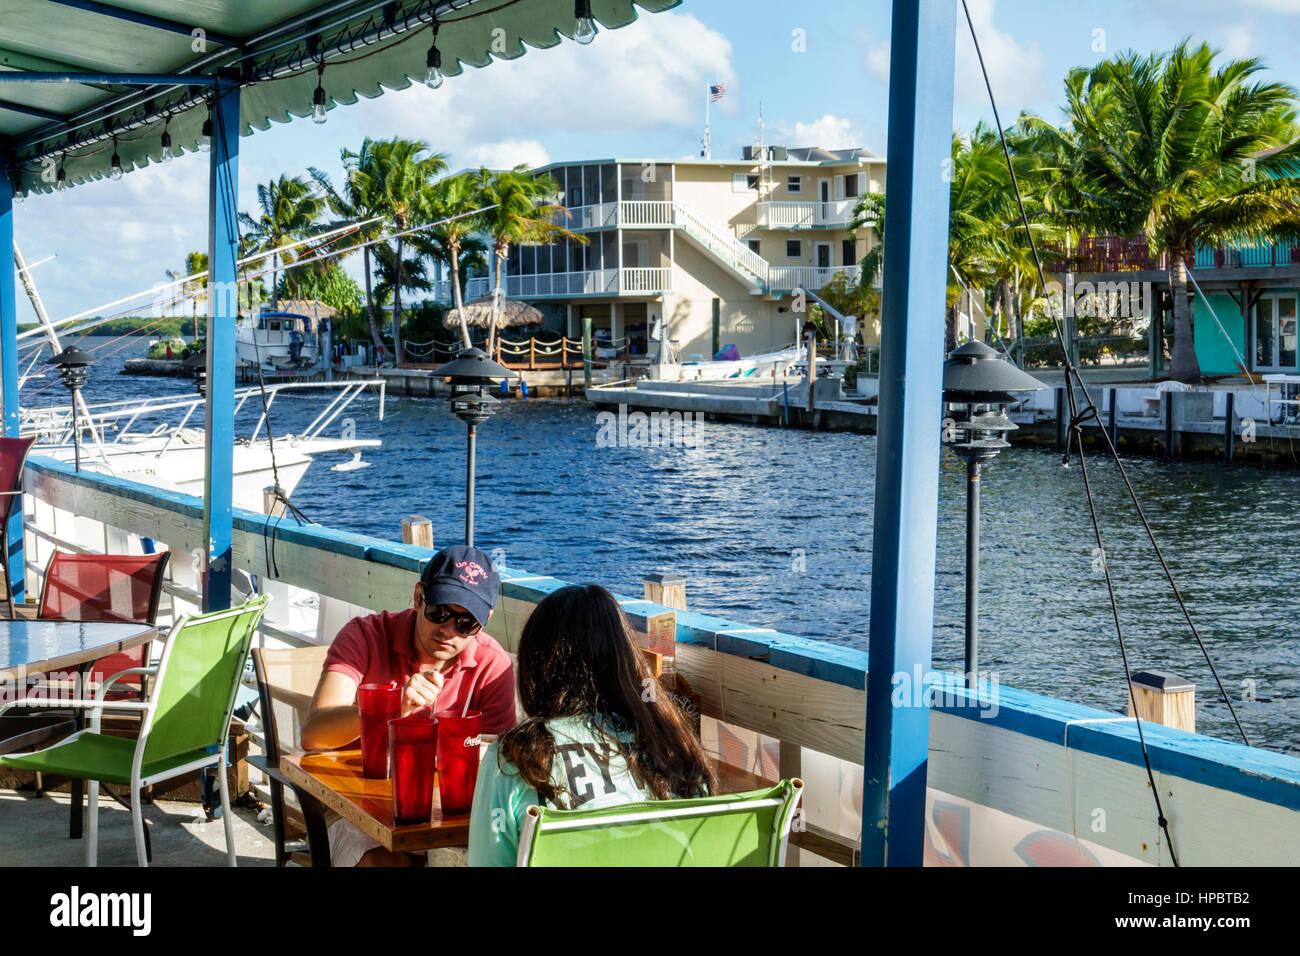 Key Largo Florida Upper Florida Keys Garden Cove Shipwrecks